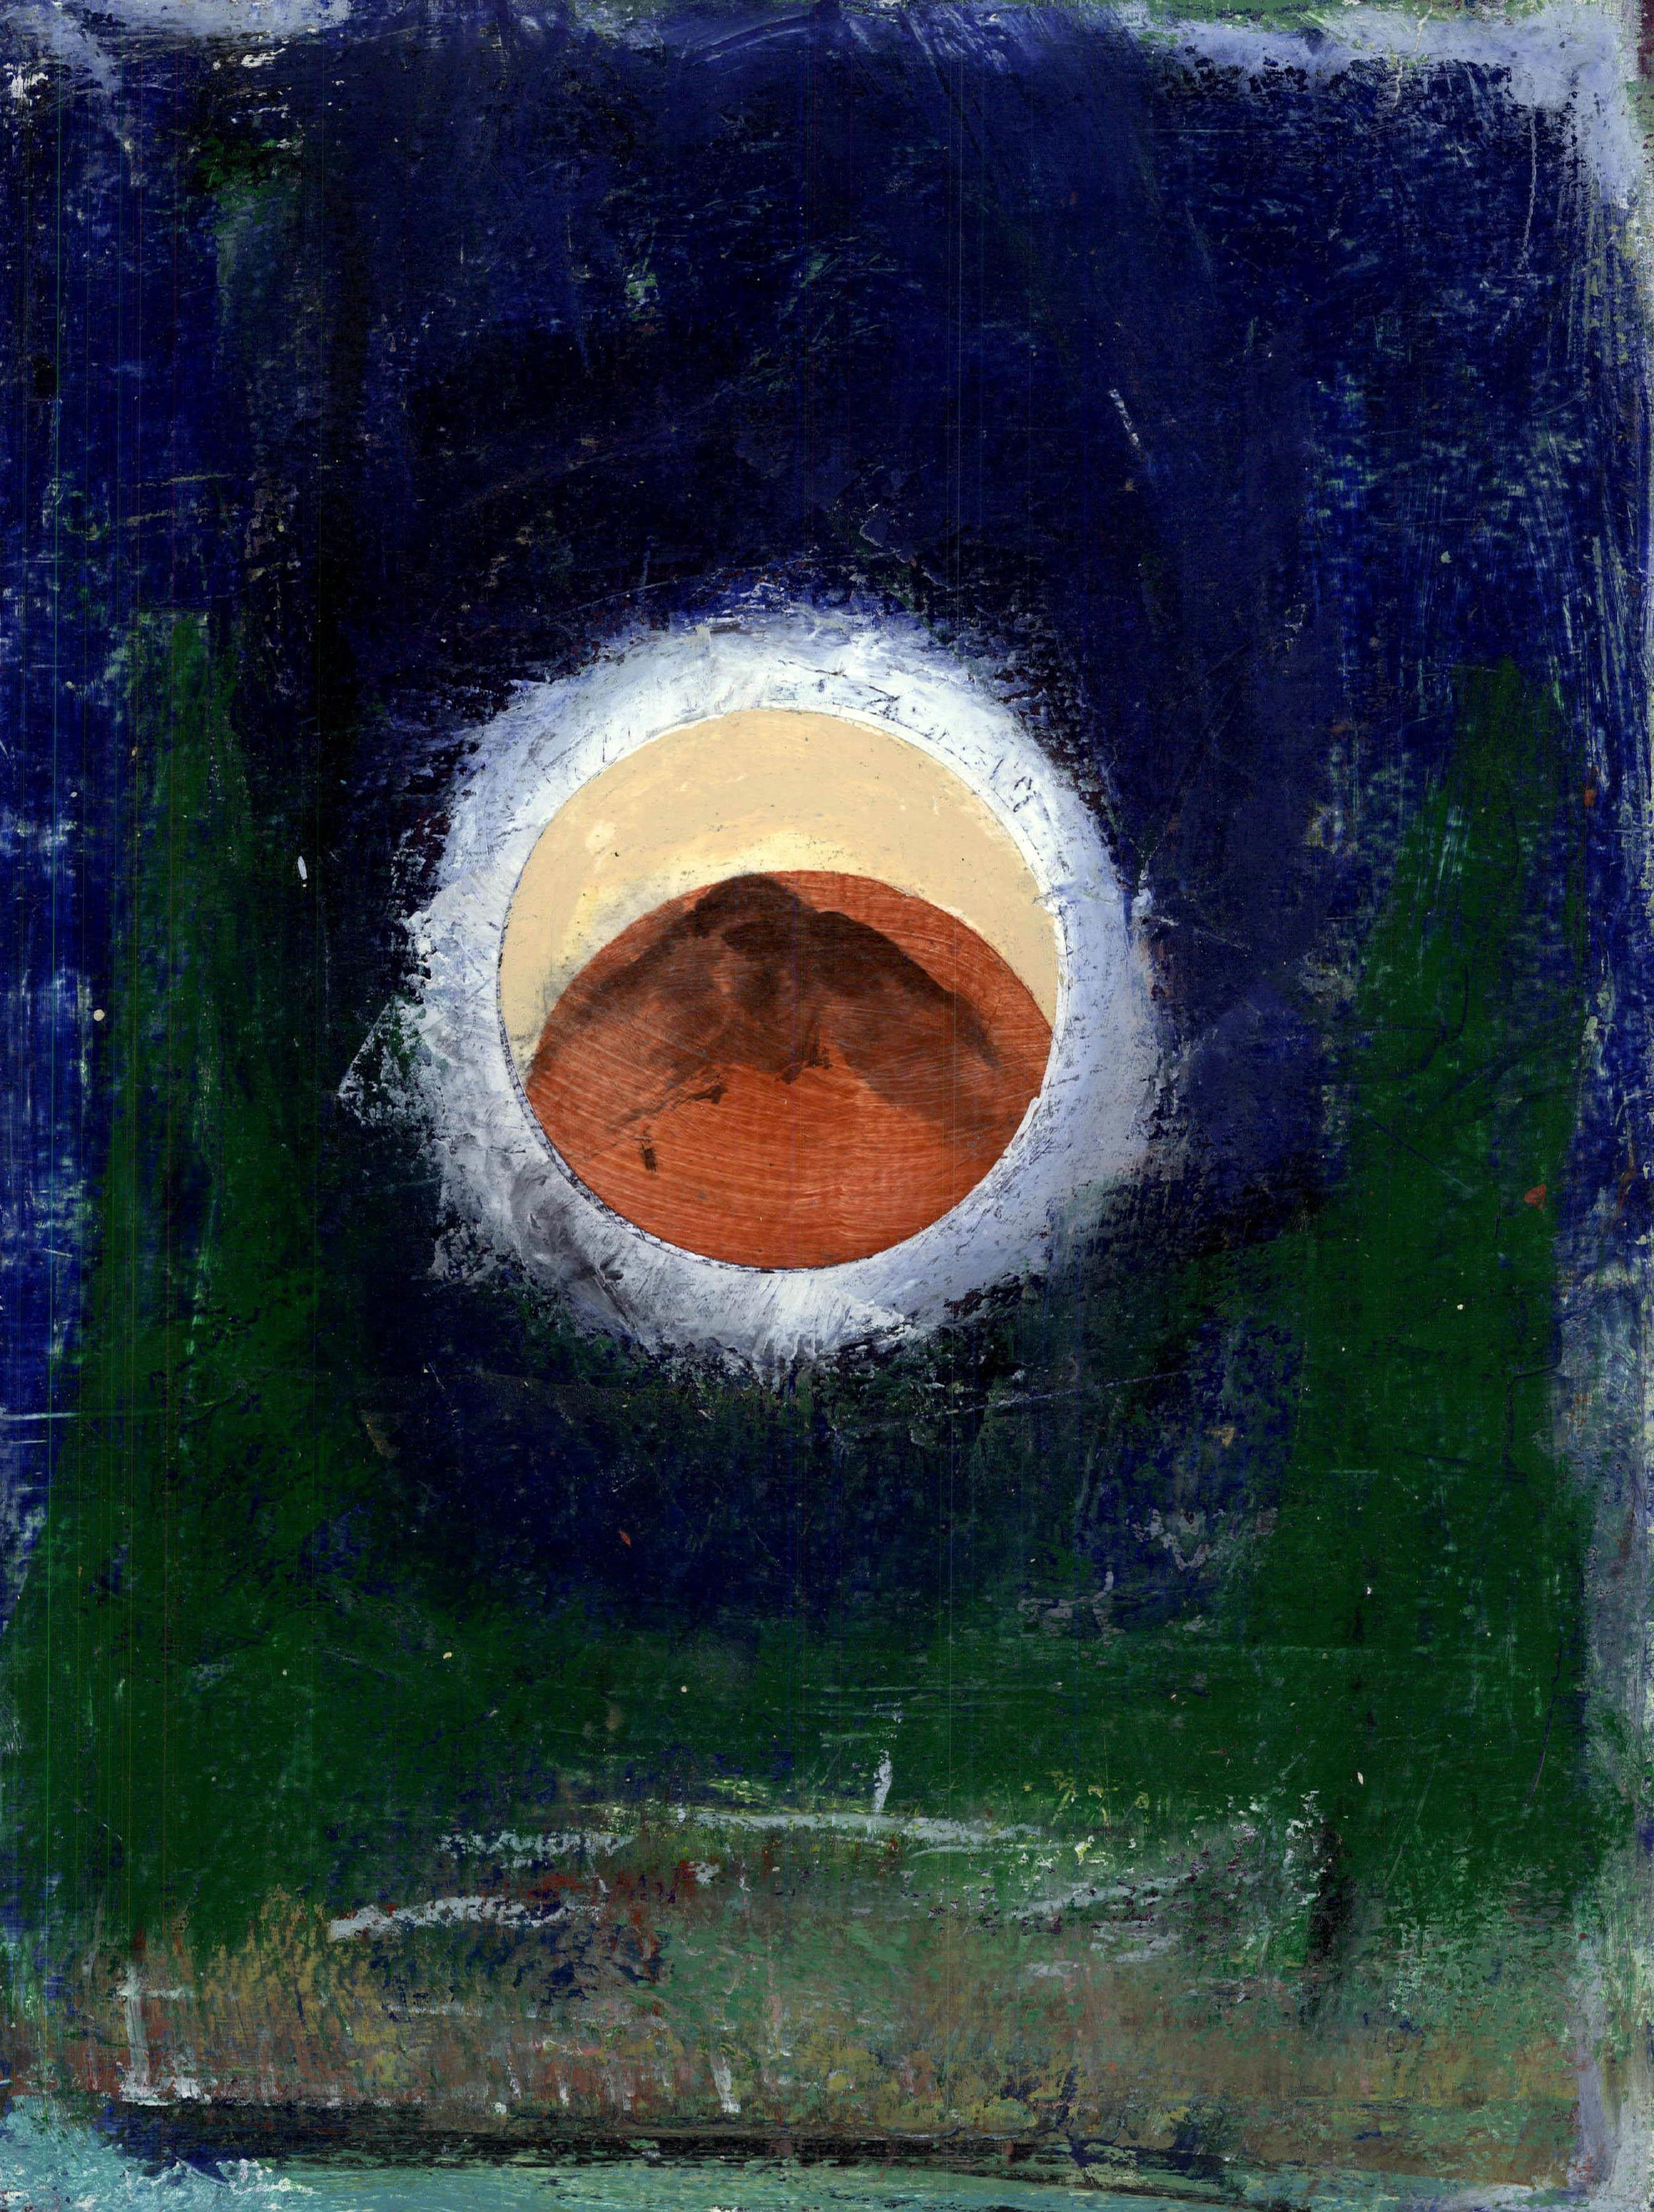 Ecliptic Meditations III